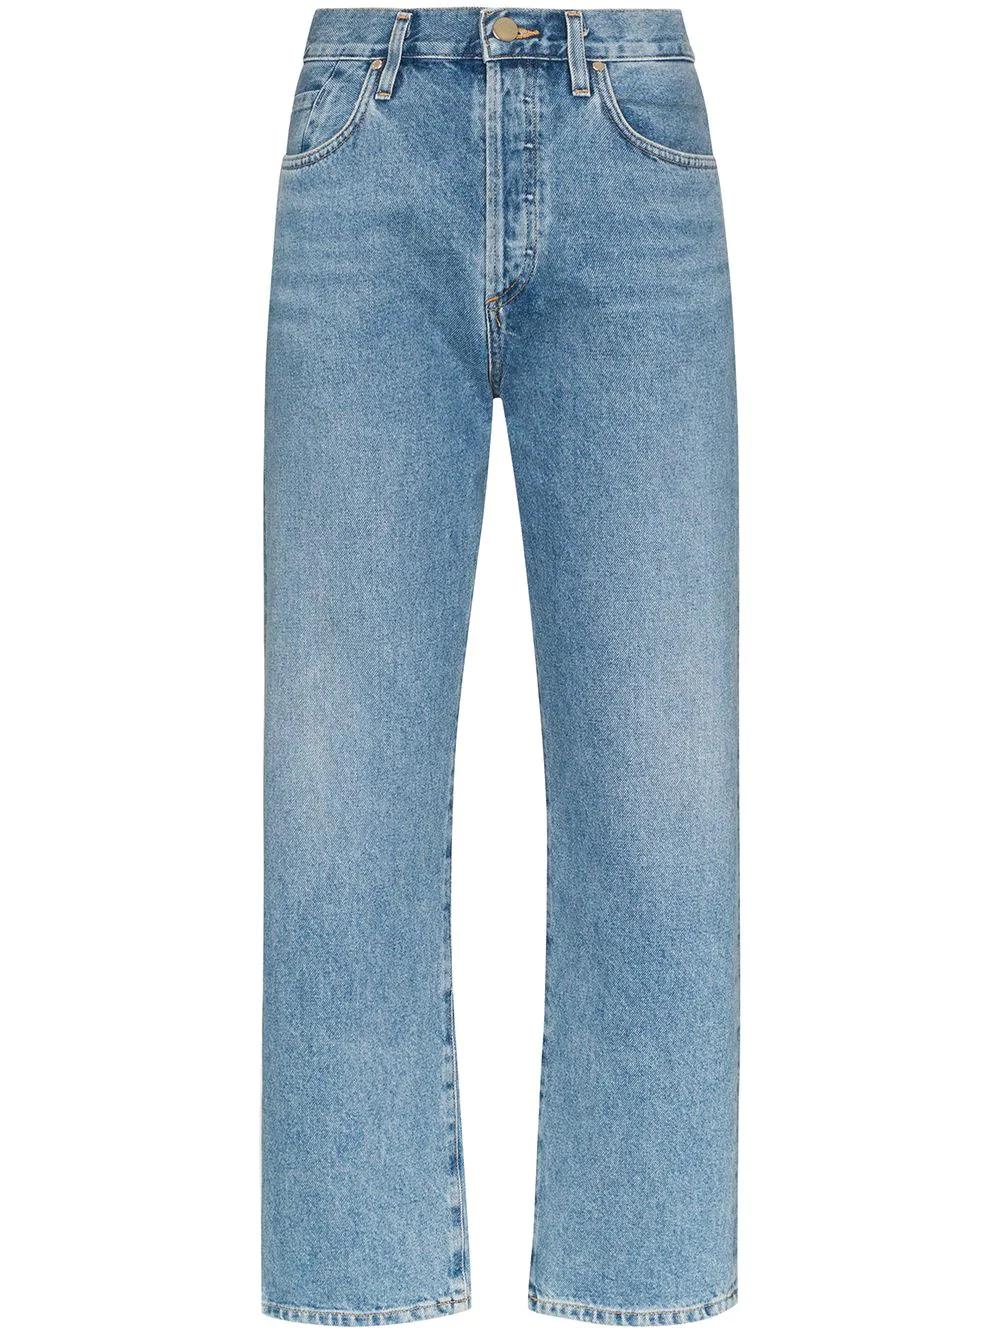 Goldsign Jeans Rectos Holgados De Tiro Medio Farfetch Jeans Rectos Ropa Ropa De Hombre